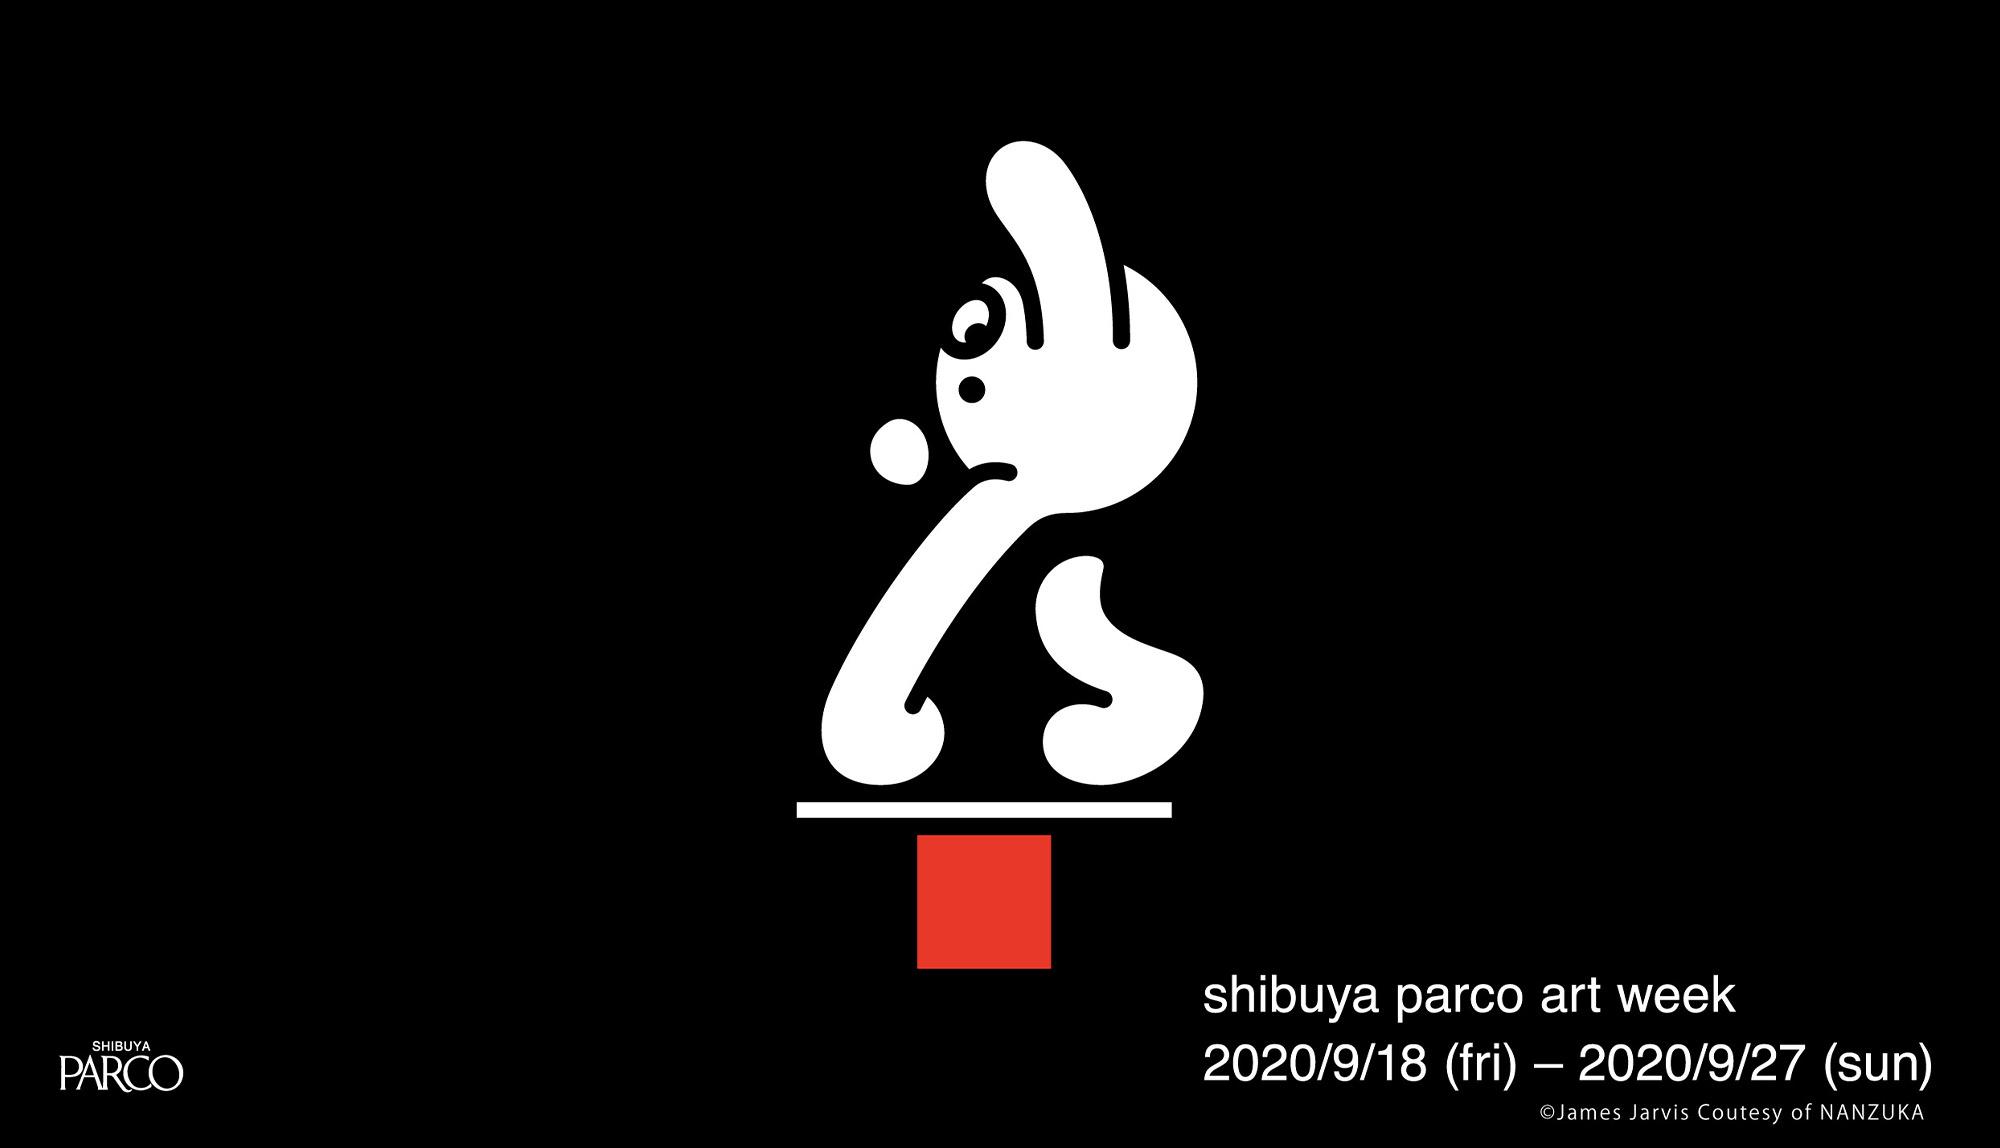 SHIBUYA PARCO ART WEEK|芸術の秋到来。渋谷PARCOがアートに染まる10日間。